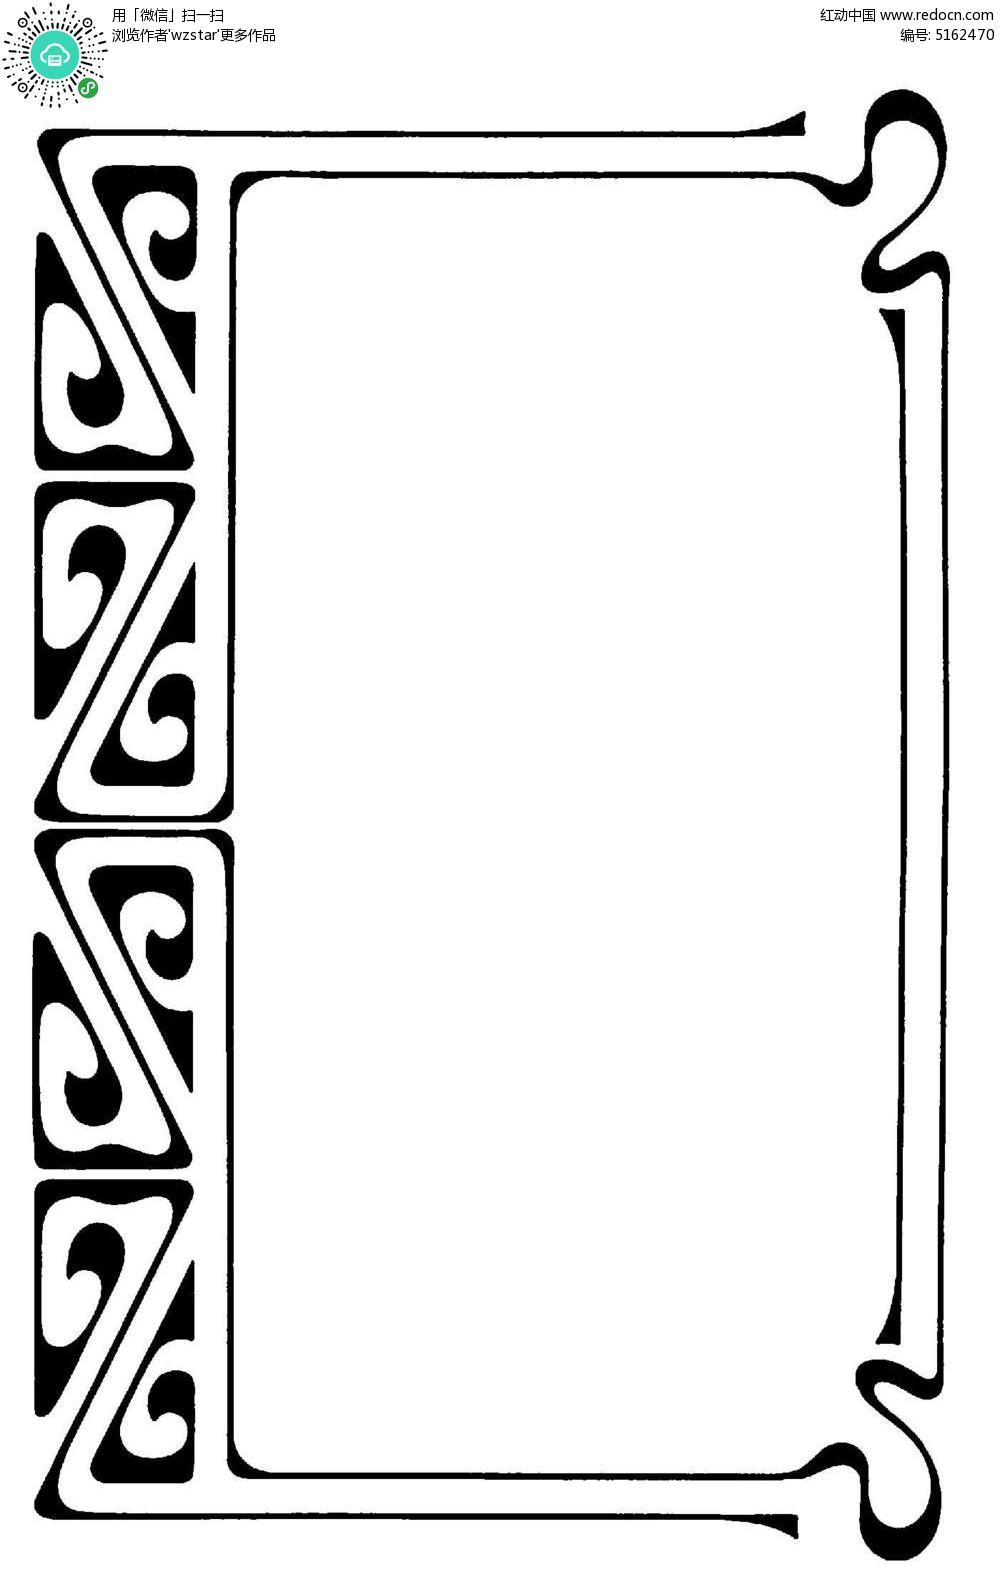 ppt 背景 背景图片 边框 模板 设计 相框 1000_1567 竖版 竖屏